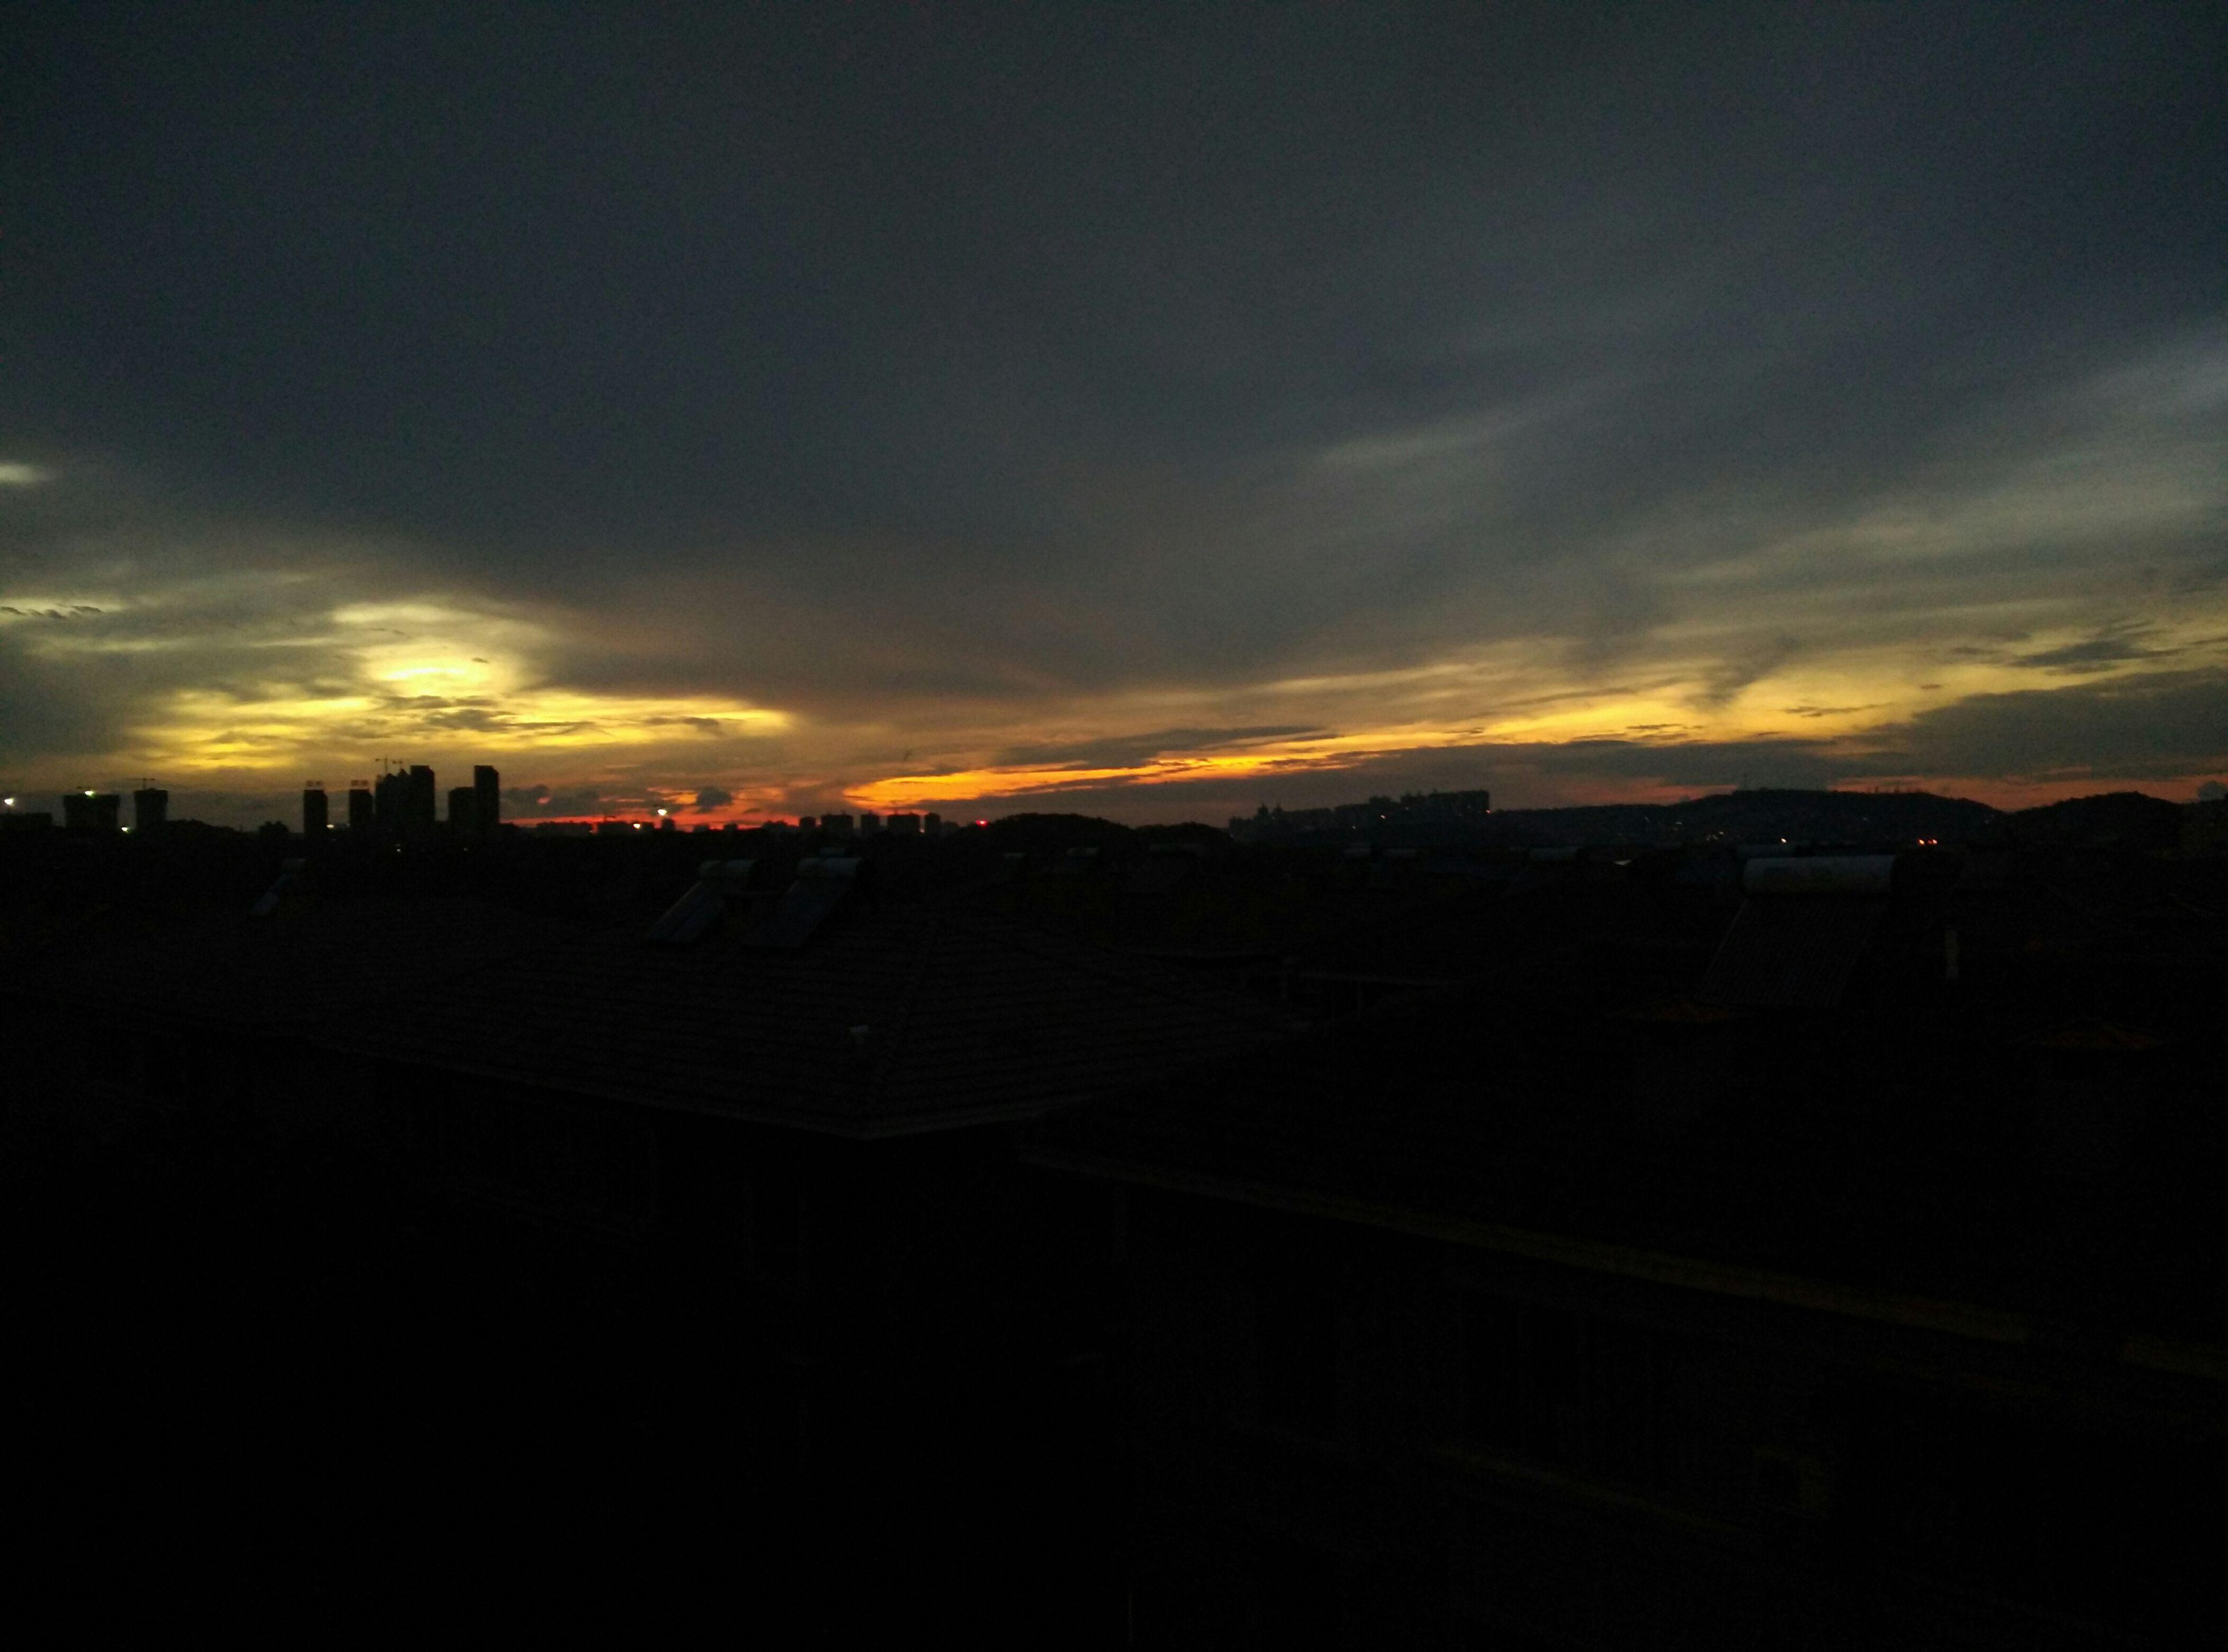 sunset, silhouette, building exterior, sky, built structure, architecture, scenics, cloud - sky, beauty in nature, orange color, dark, tranquil scene, dusk, tranquility, house, nature, landscape, cloud, residential structure, city